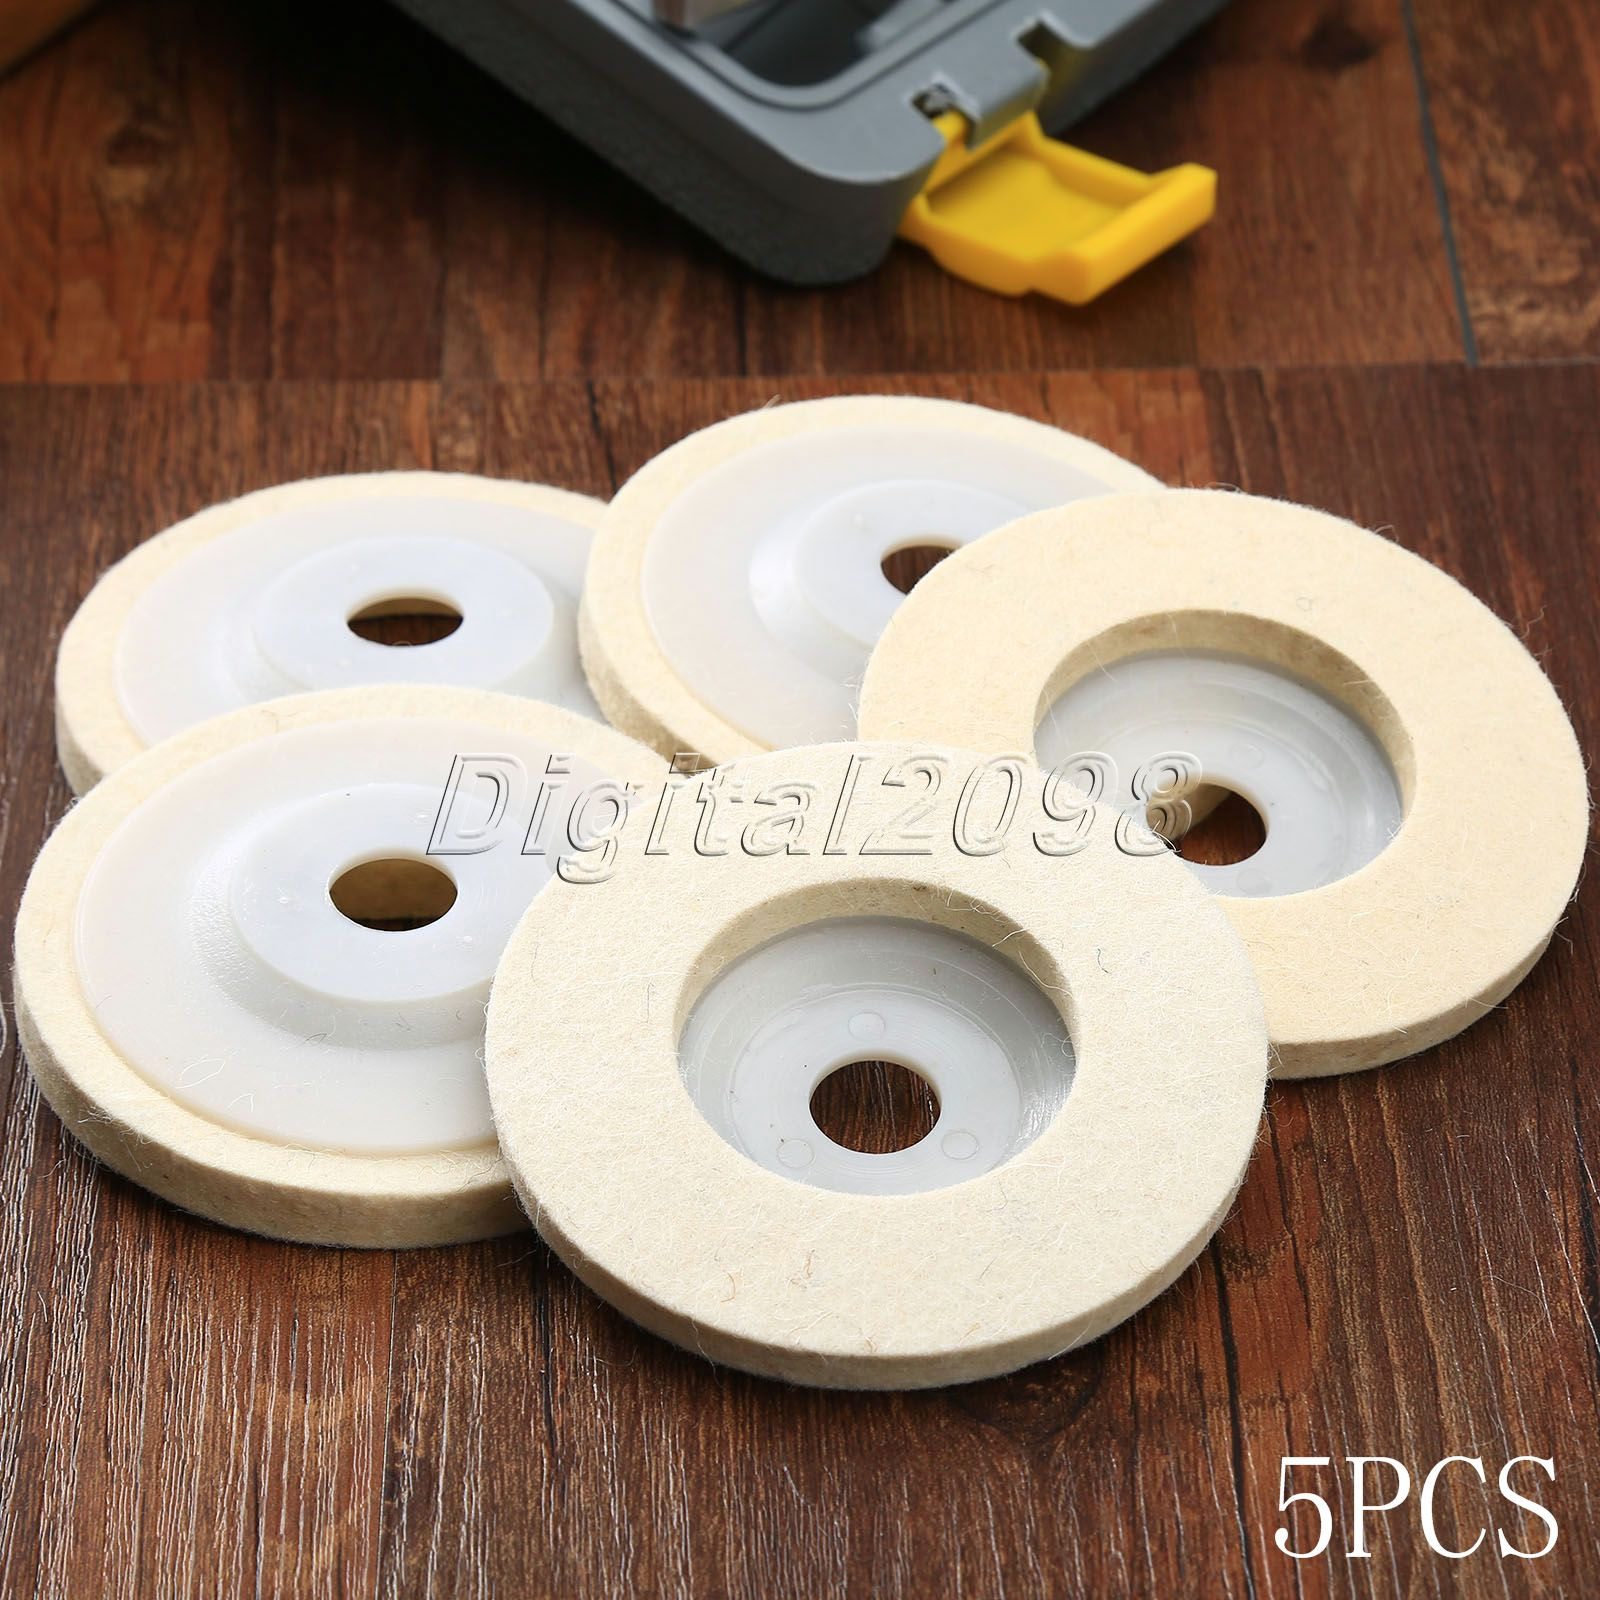 Yetaha 5Pcs 4 inch Round Polishing Wheel Pad Wool Felt Buffing Polishers Pads Dia 100mm Pearl Cloth Buffing Pads